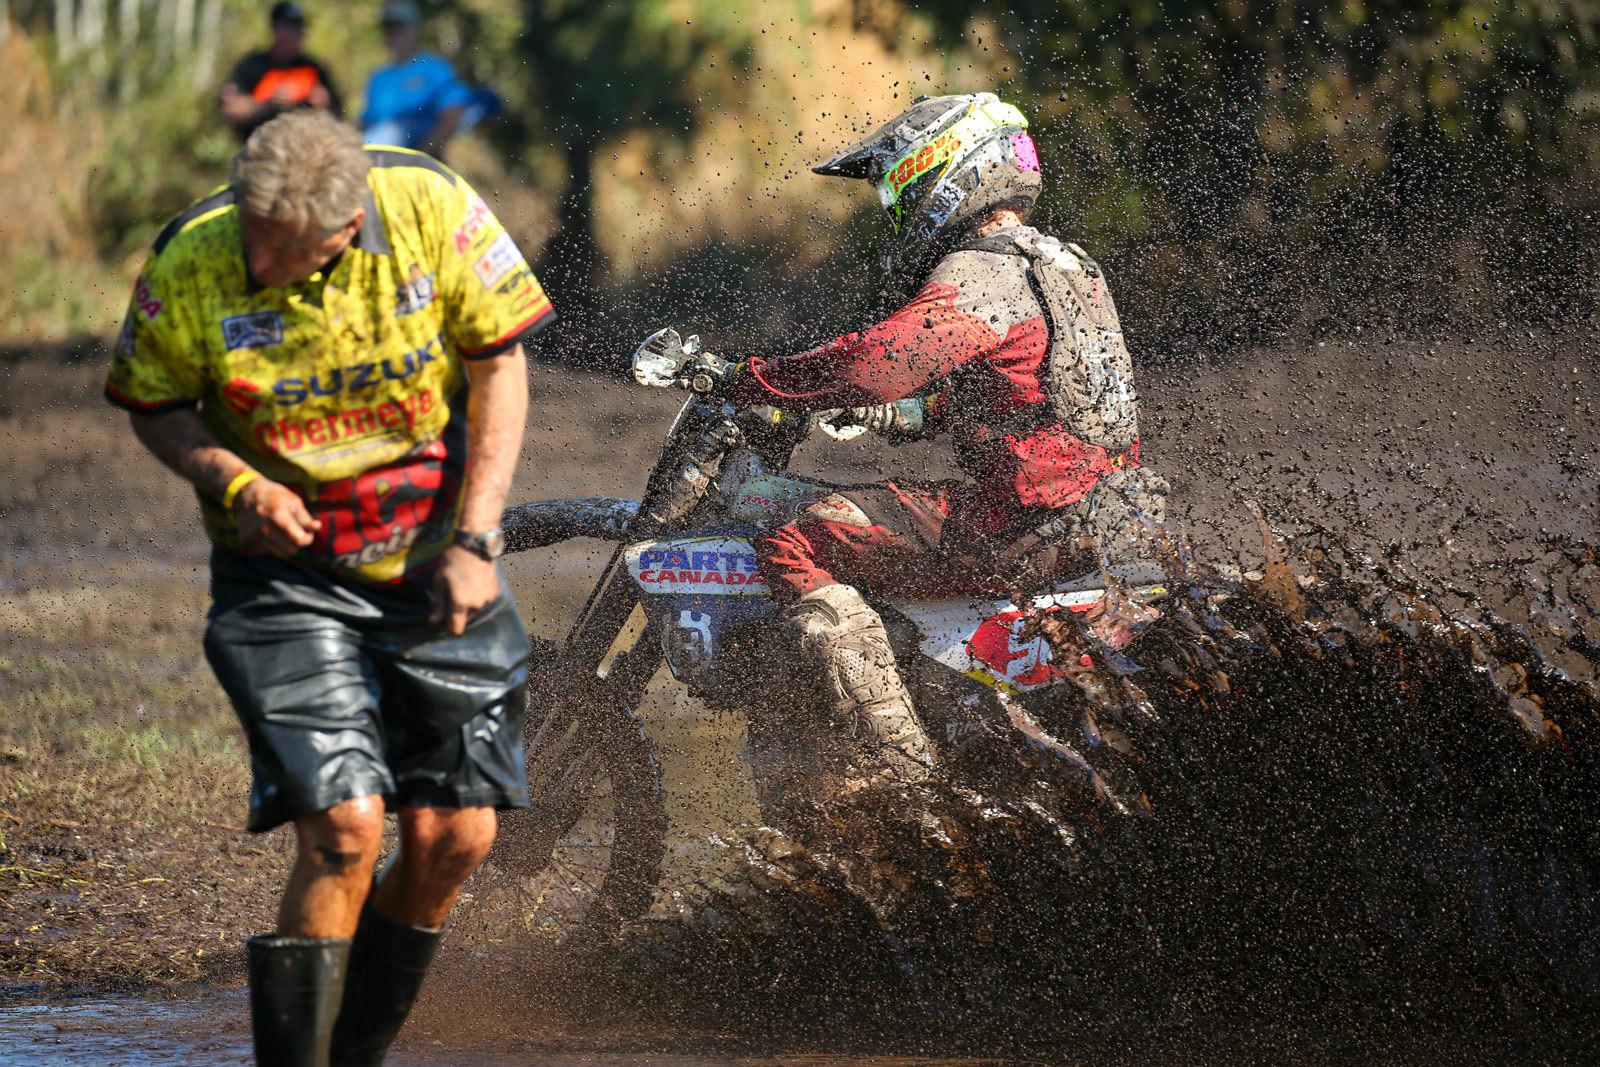 Tyler Medaglia - Wild Boar GNCC  - Motocross Pictures - Vital MX